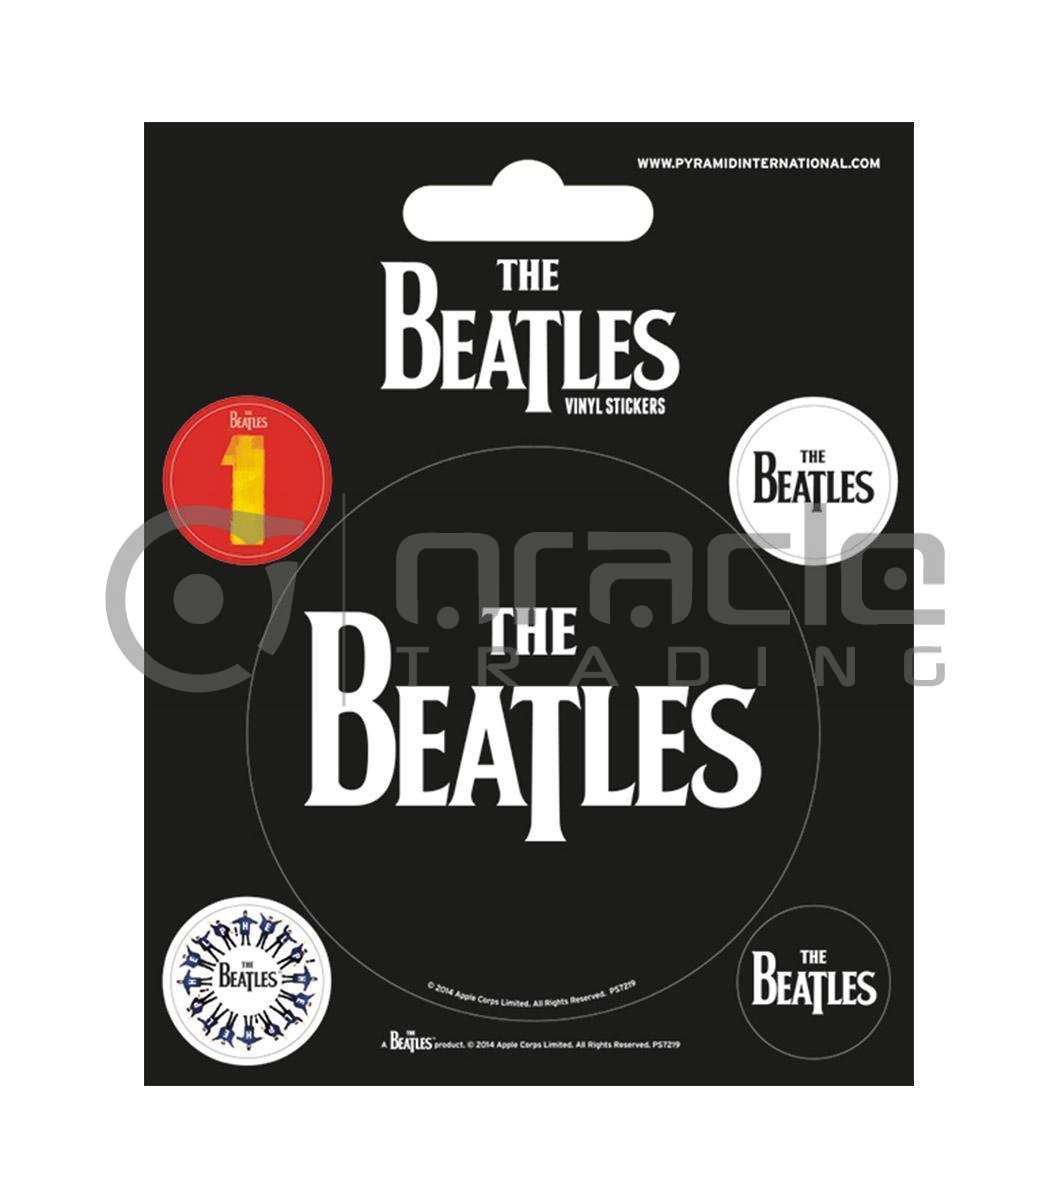 The Beatles Vinyl Sticker Pack - Classic